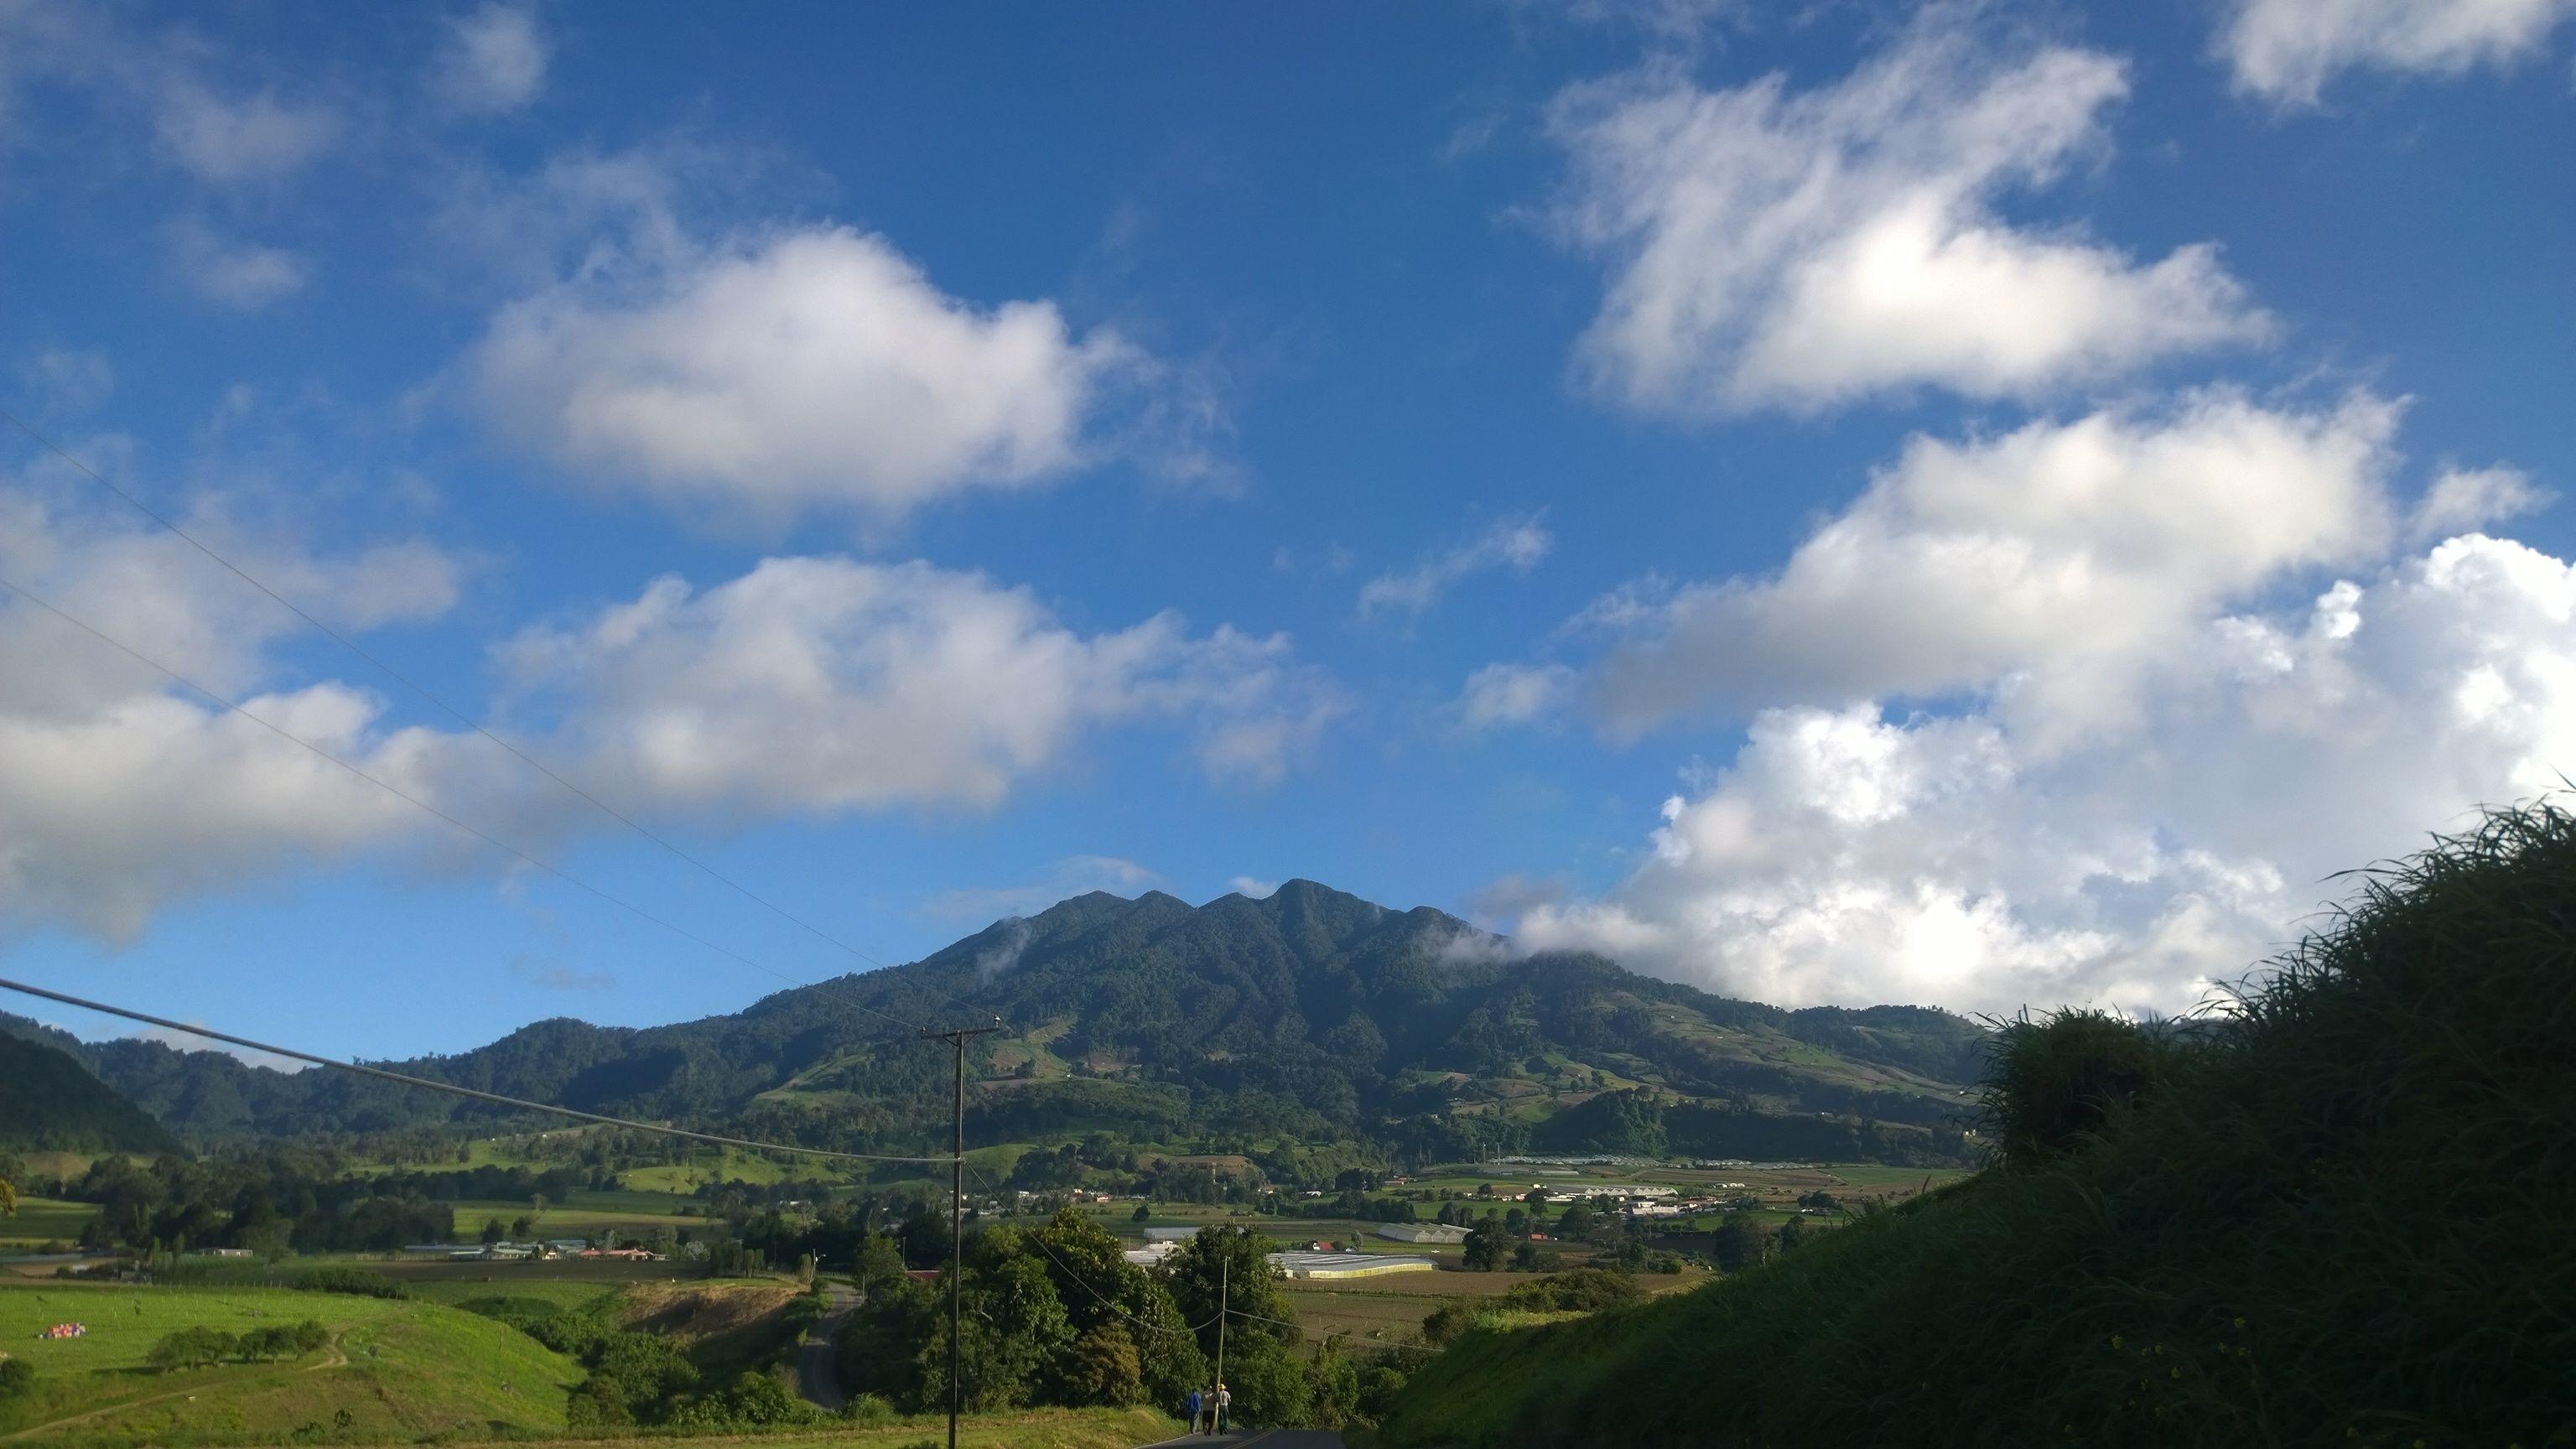 Panamá volcan baru